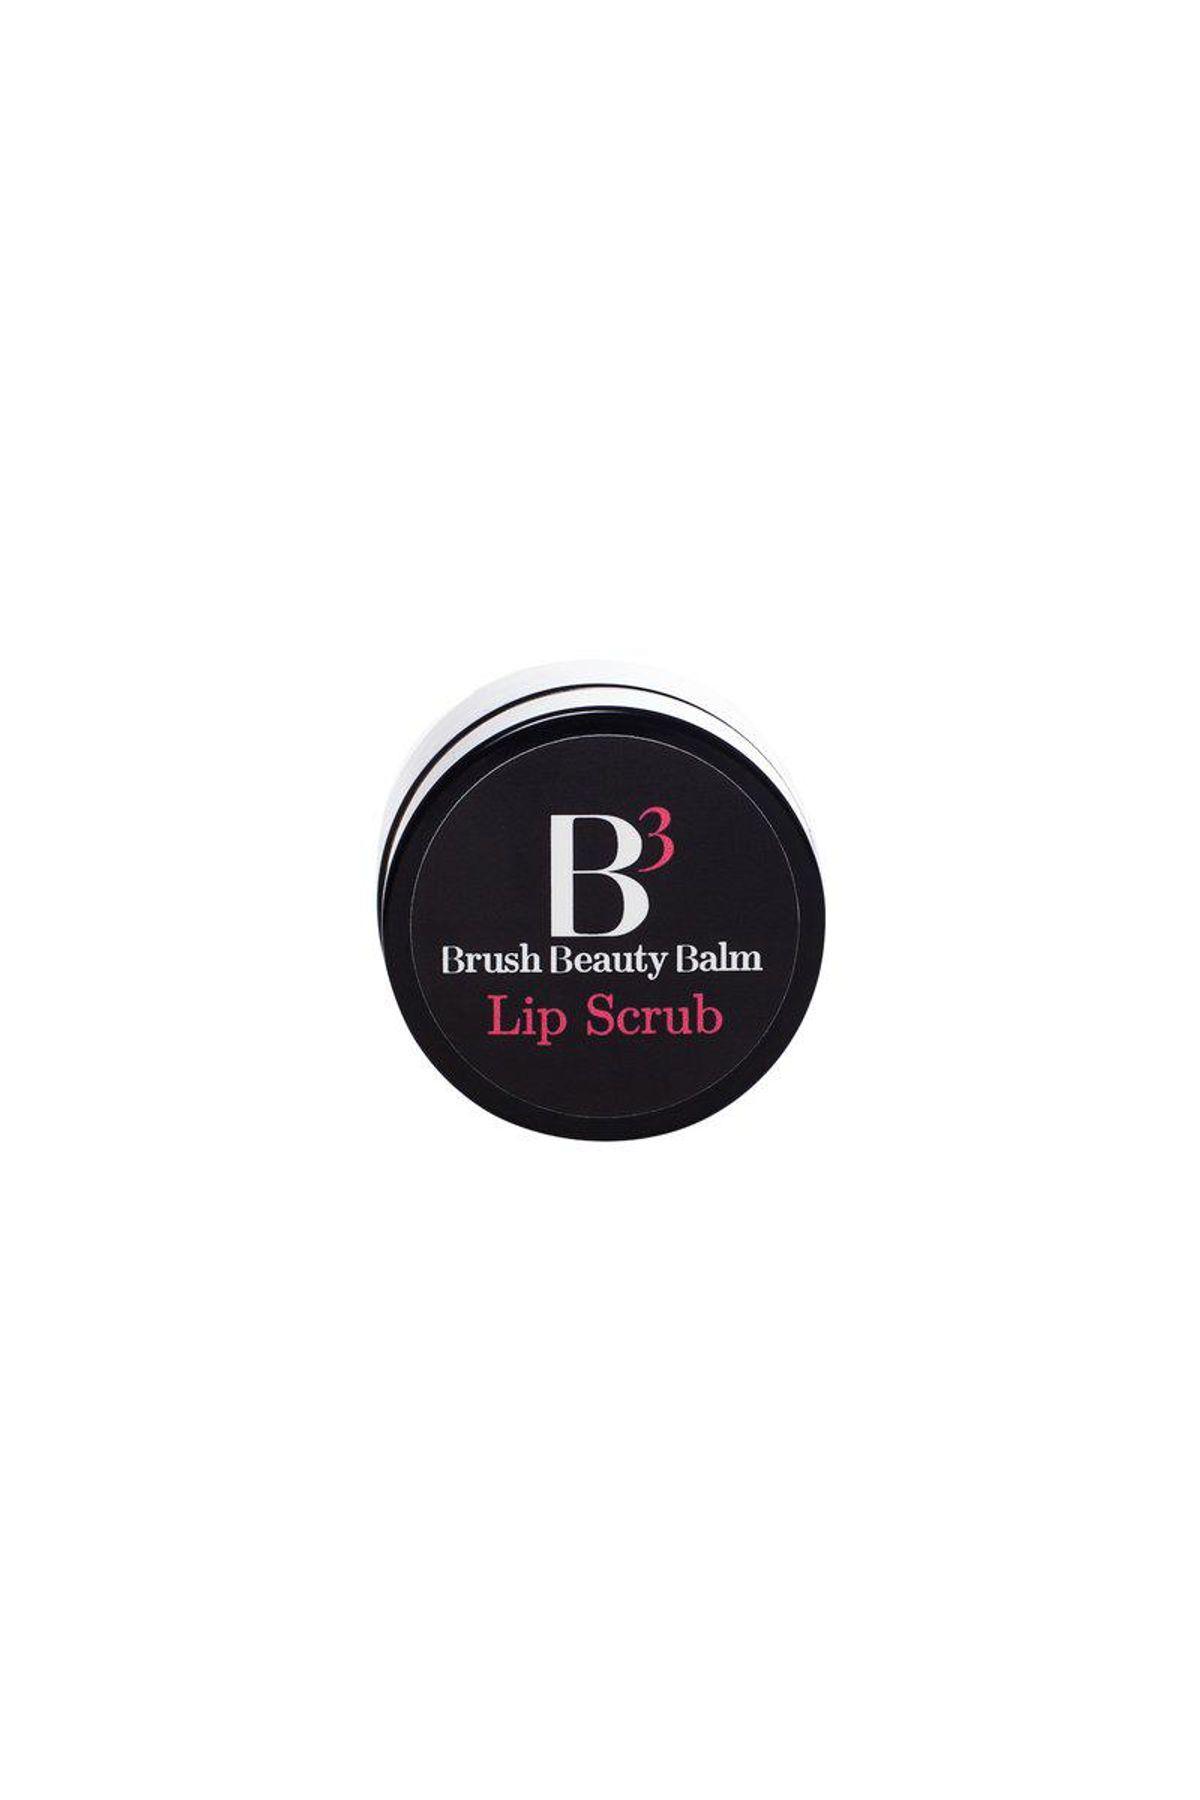 b3 brush beauty balm lip scrub